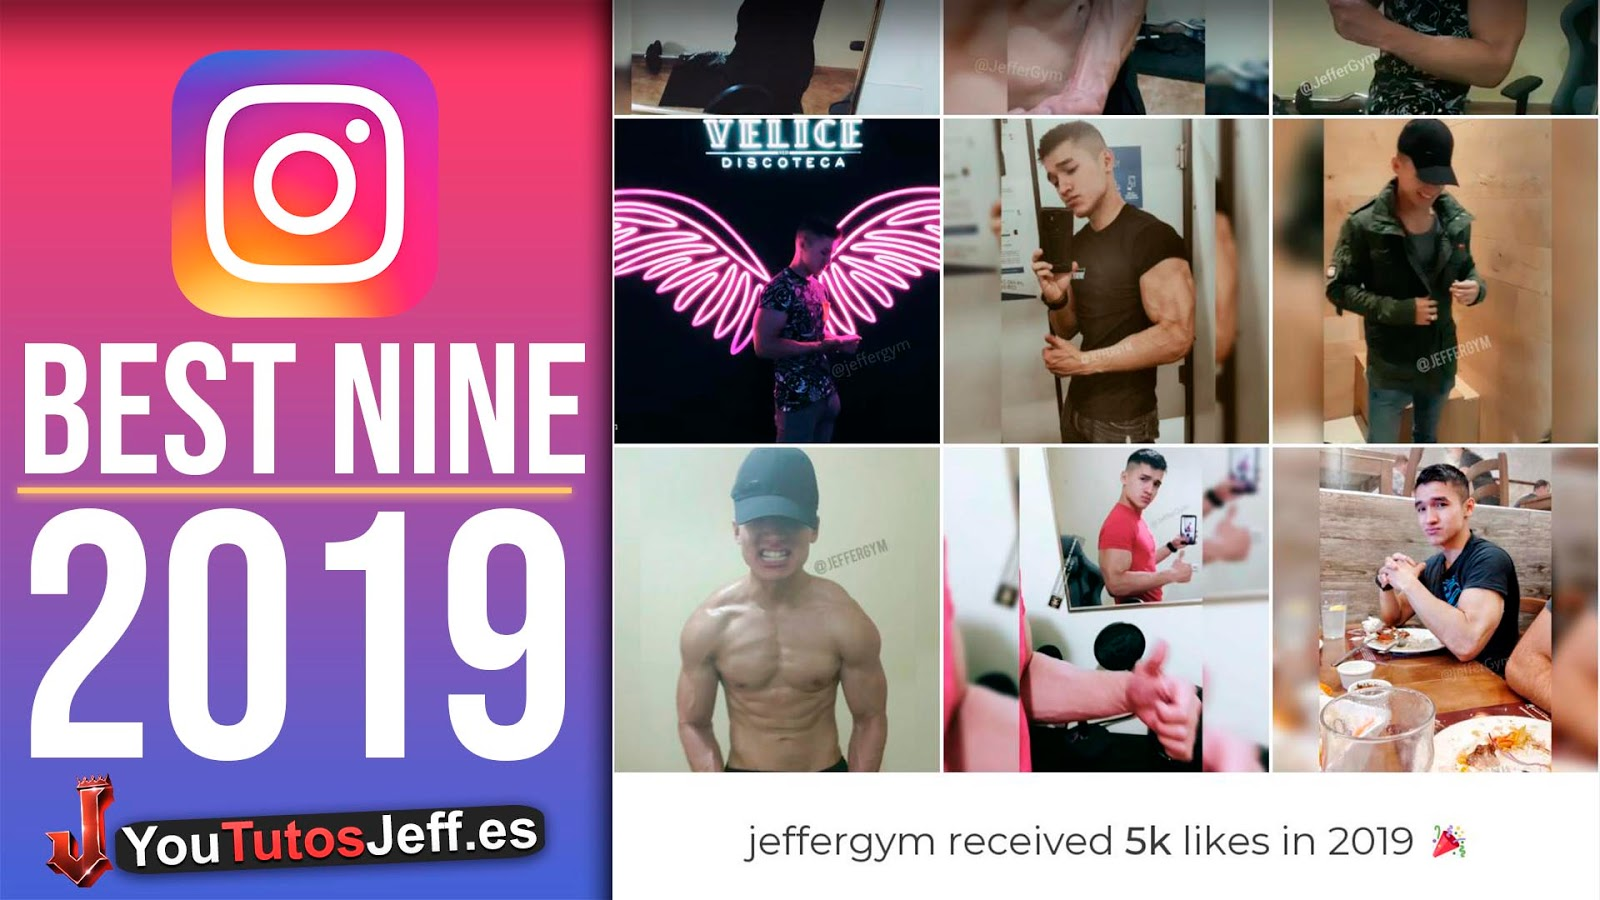 Hacer Instagram Best Nine 2019 🔥 Tus Fotos con mas Likes Instagram